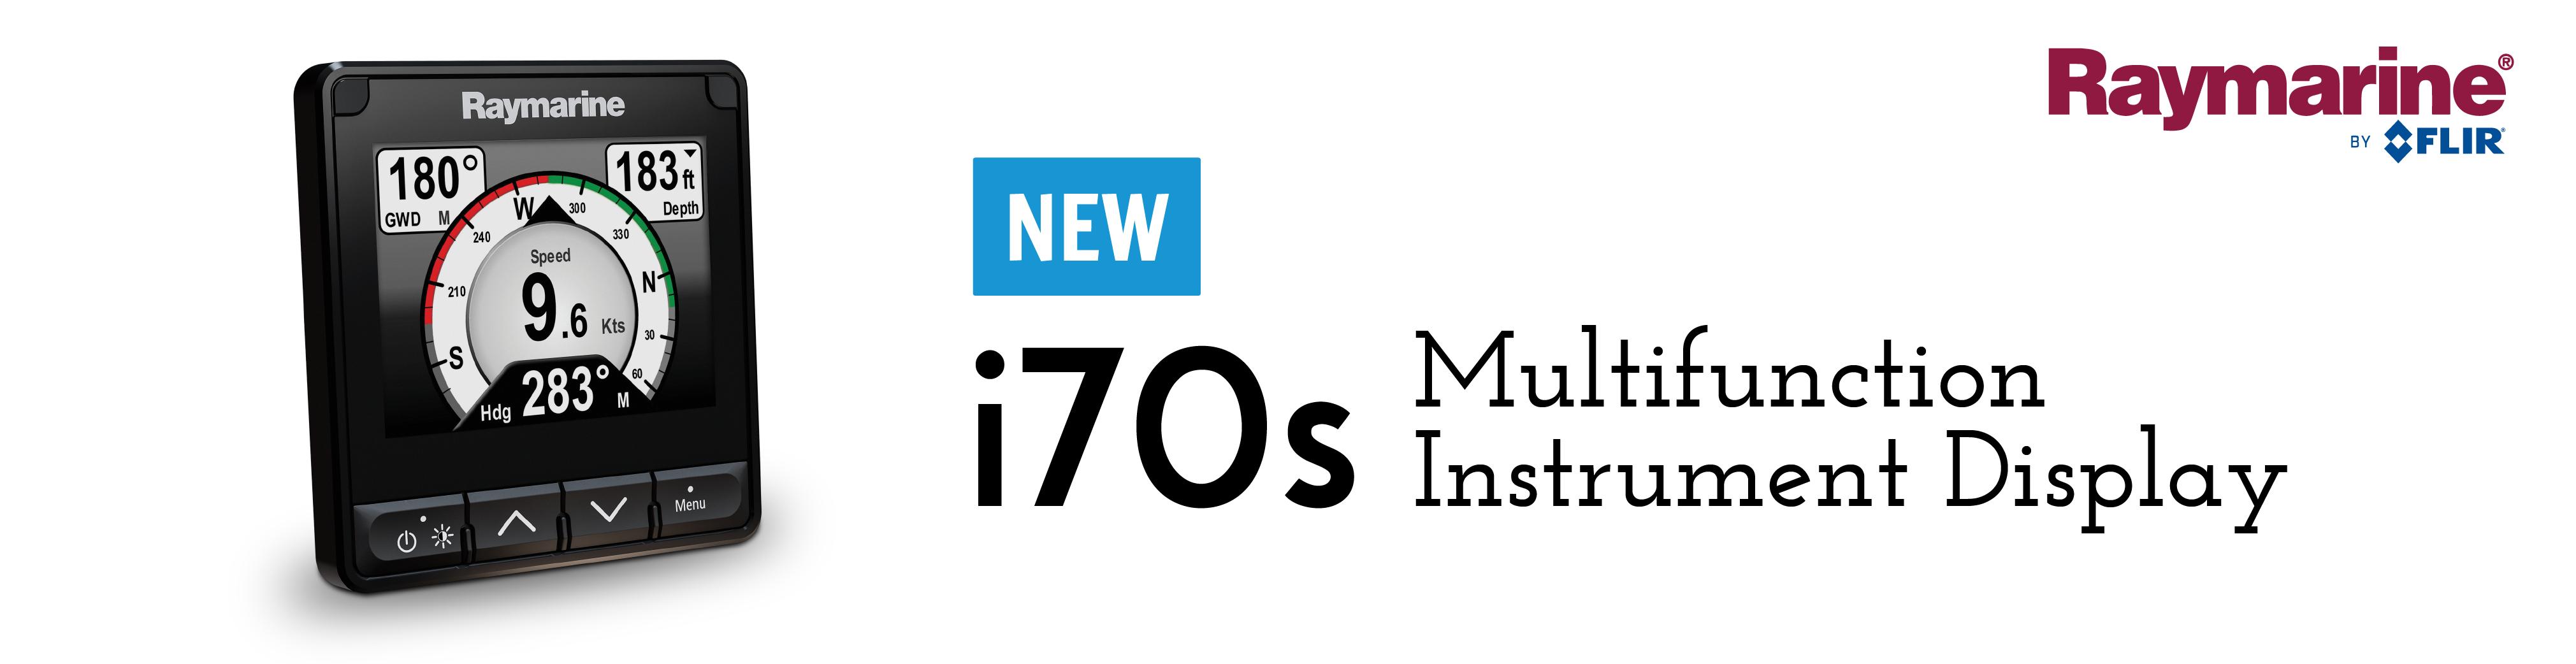 raymarine new i70s multifunction instrument display banner